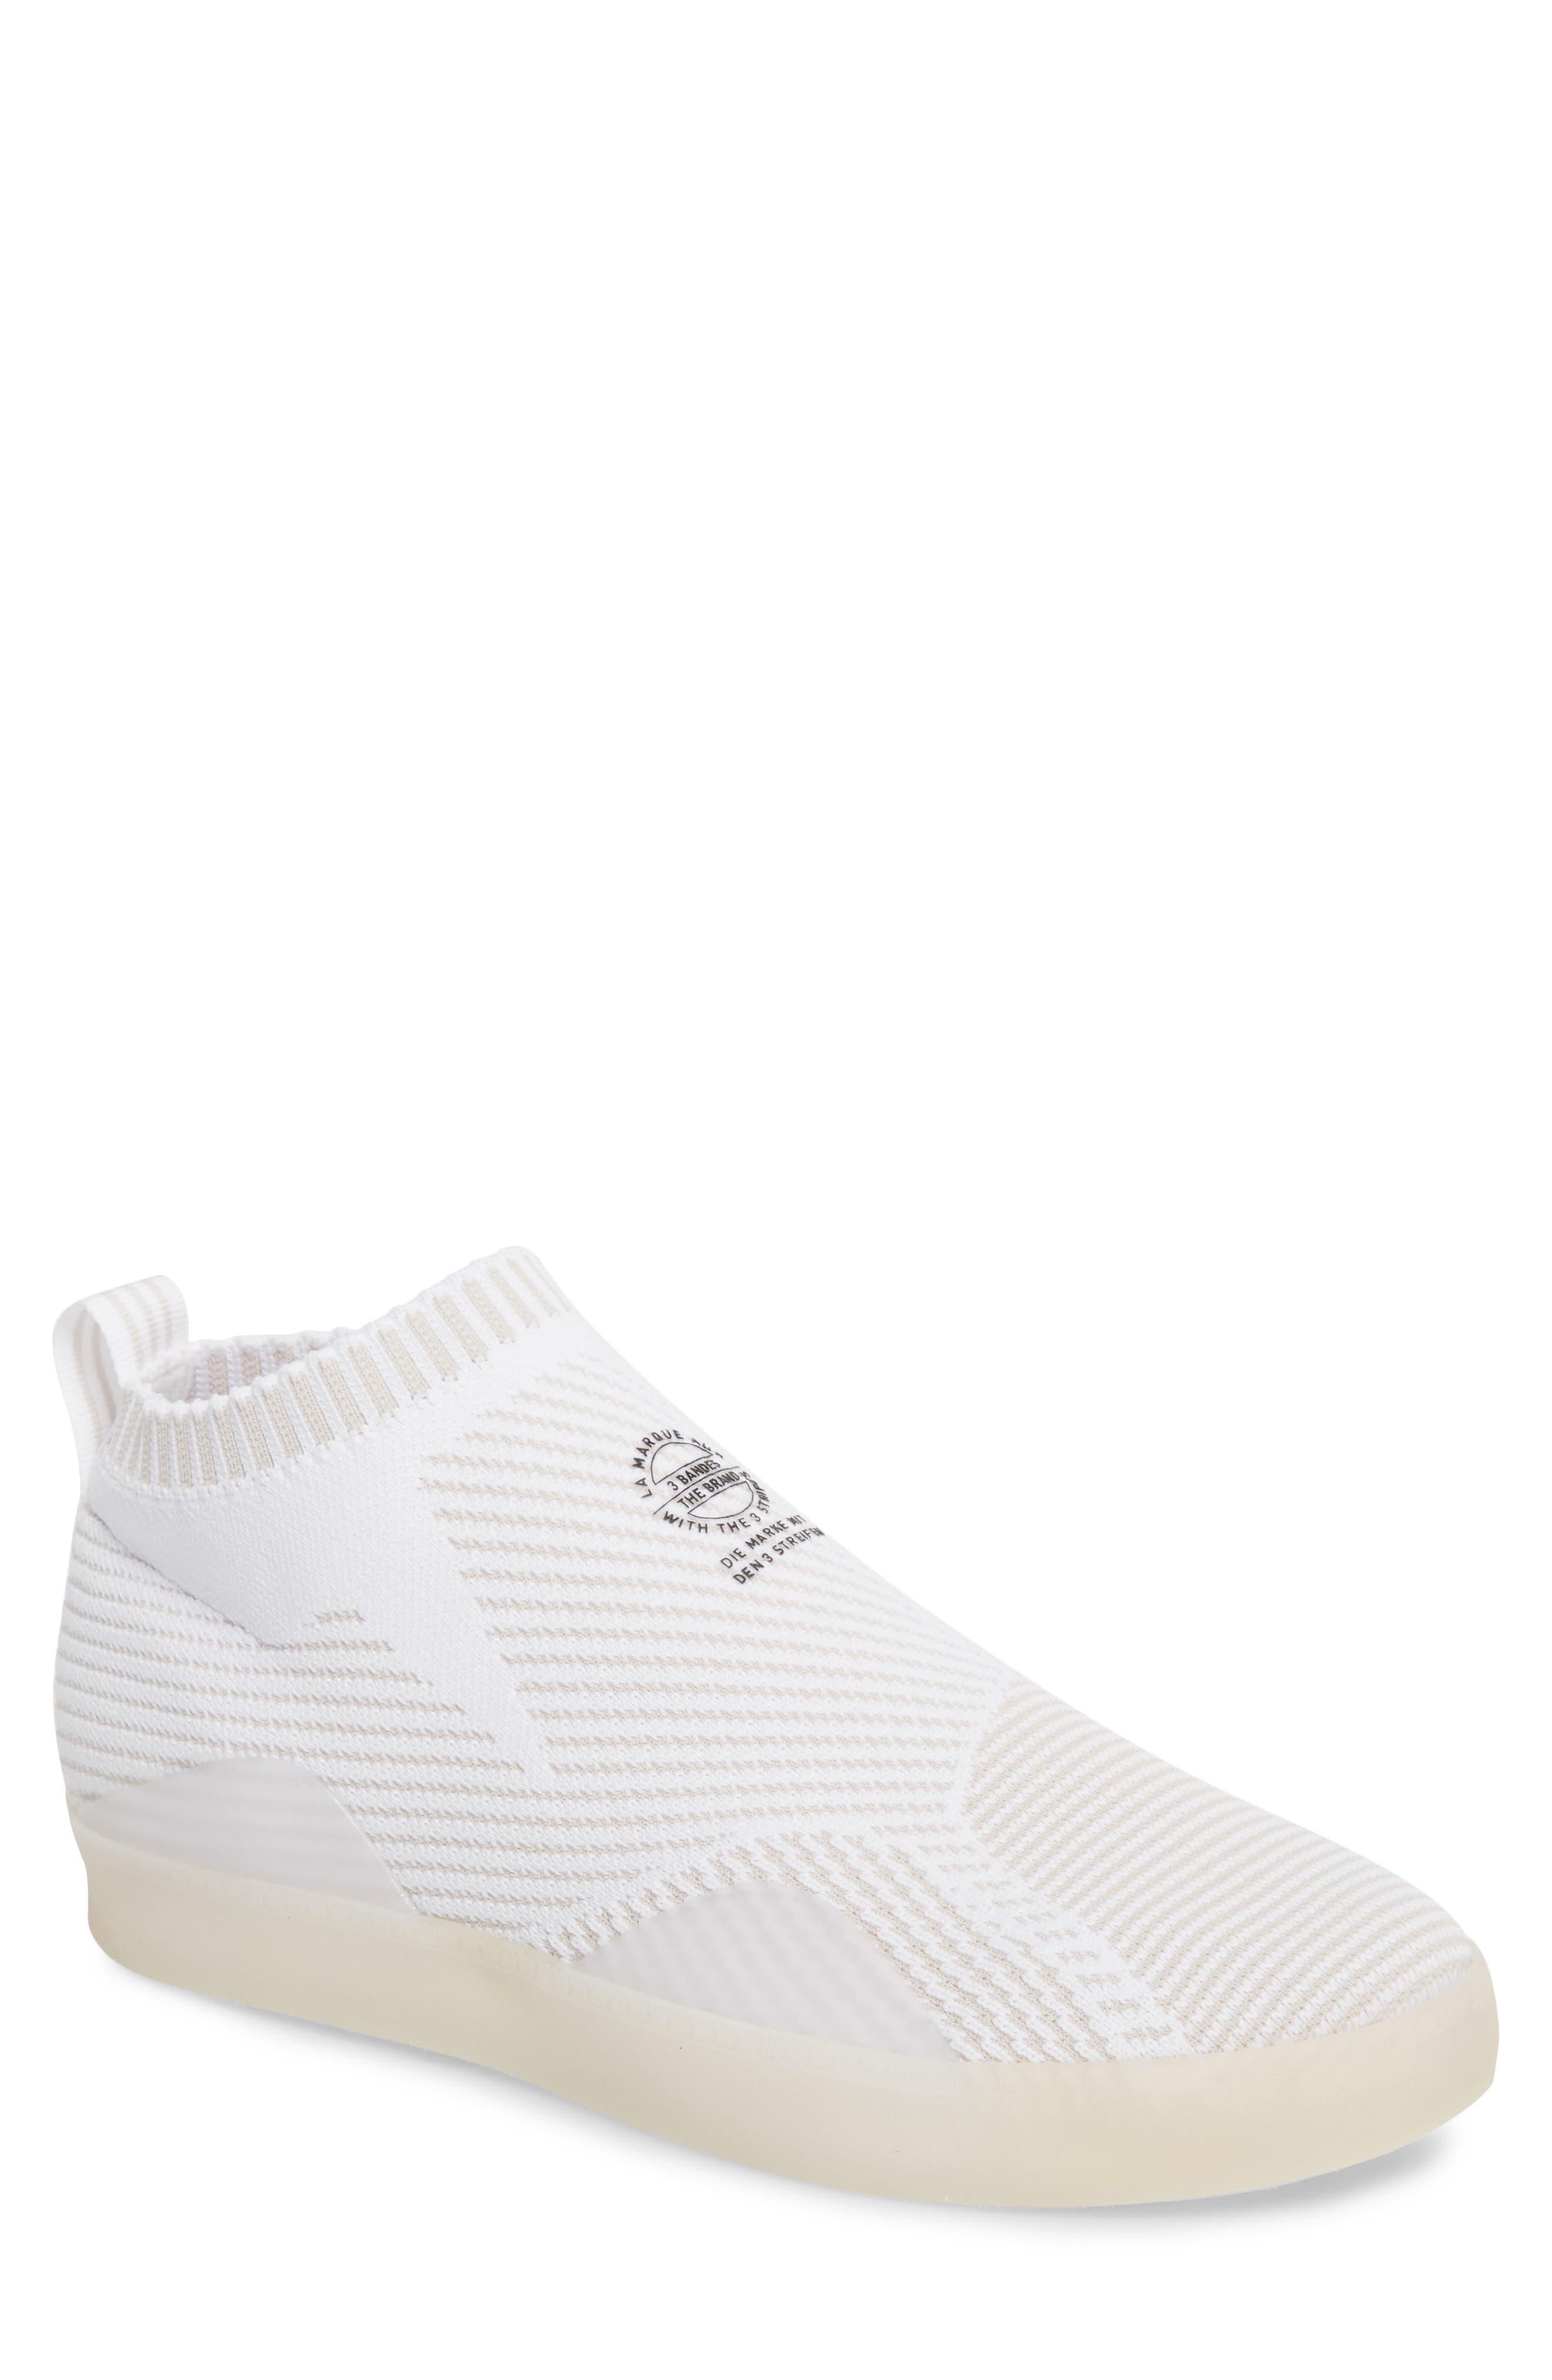 3ST.002 Primeknit Skateboarding Shoe,                         Main,                         color, White / Grey/ Black